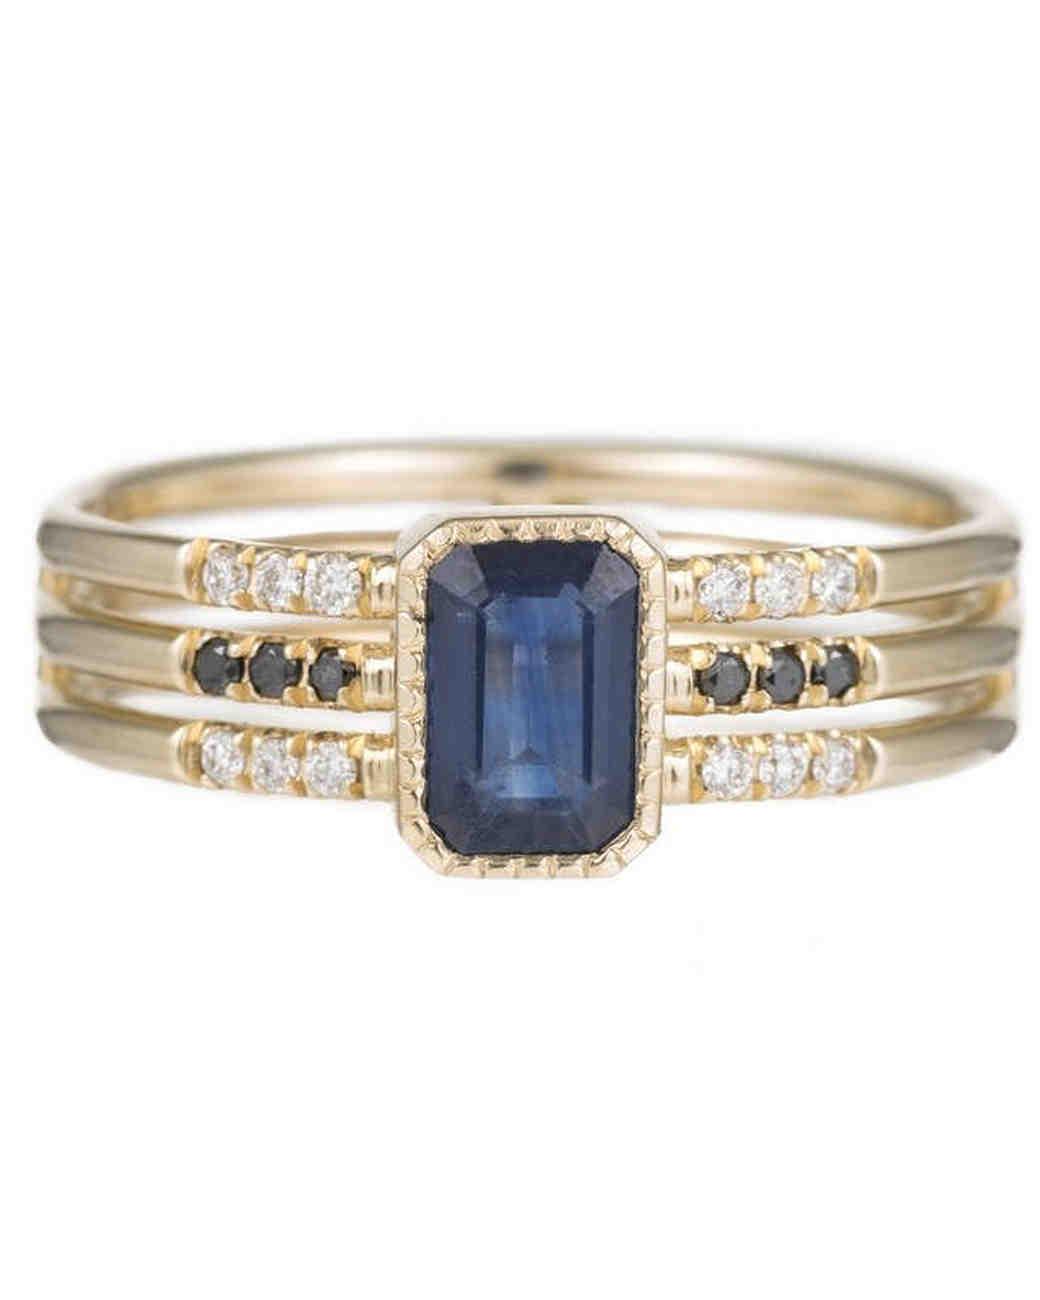 Jennie Kwon Designs Sapphire Emerald Cut Multi-Band Ring